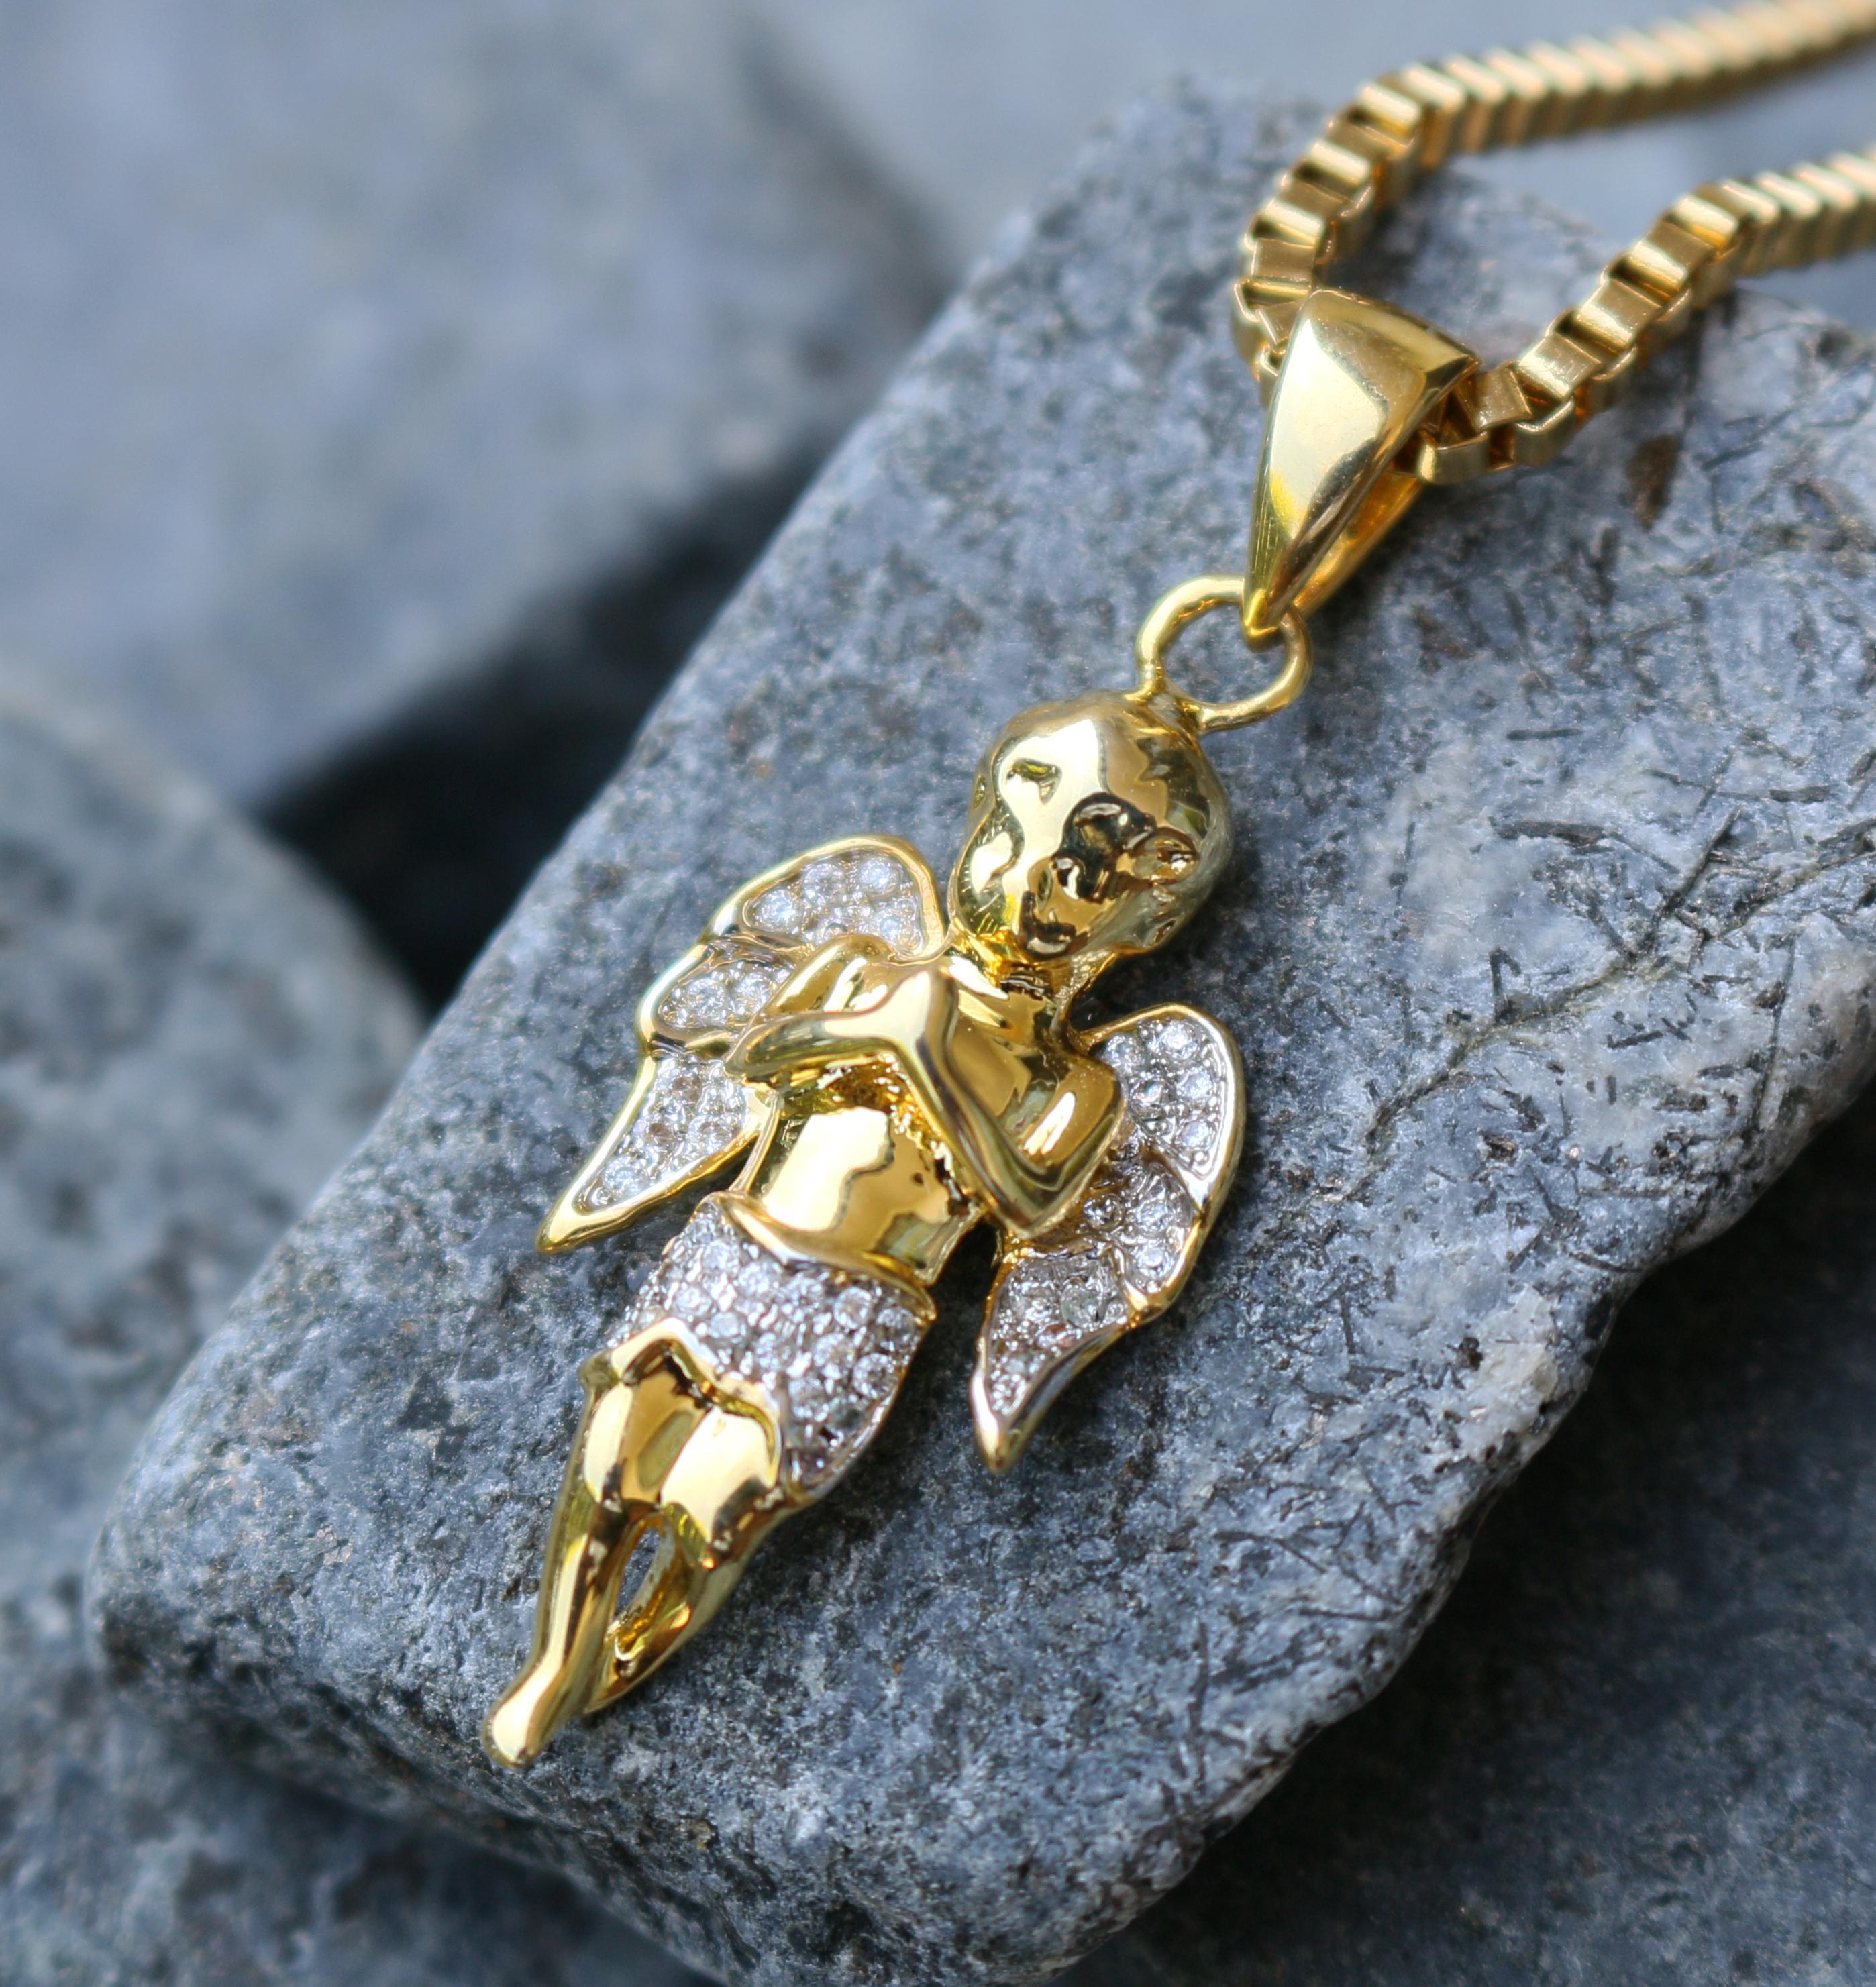 Jesus gold chain necklace images jesus gold chain necklace images necklaces men 39 s hip hop jewelry pendants chains more tsv mozeypictures Choice Image